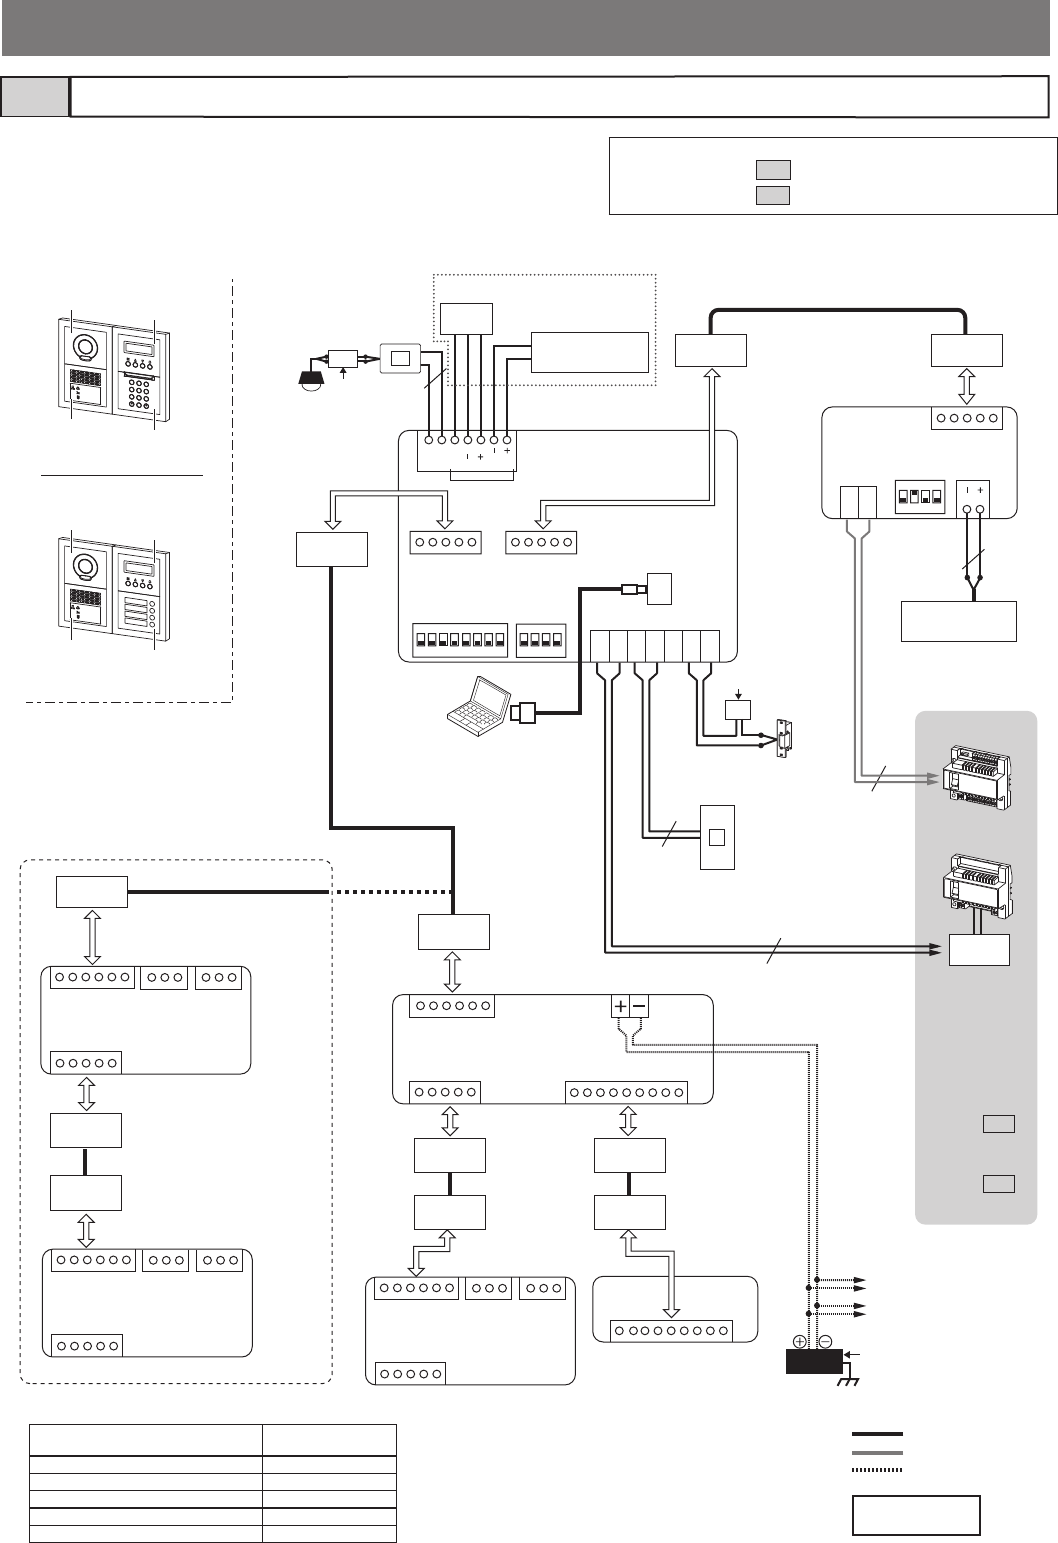 Aiphone Gt Installation En 17 03 B